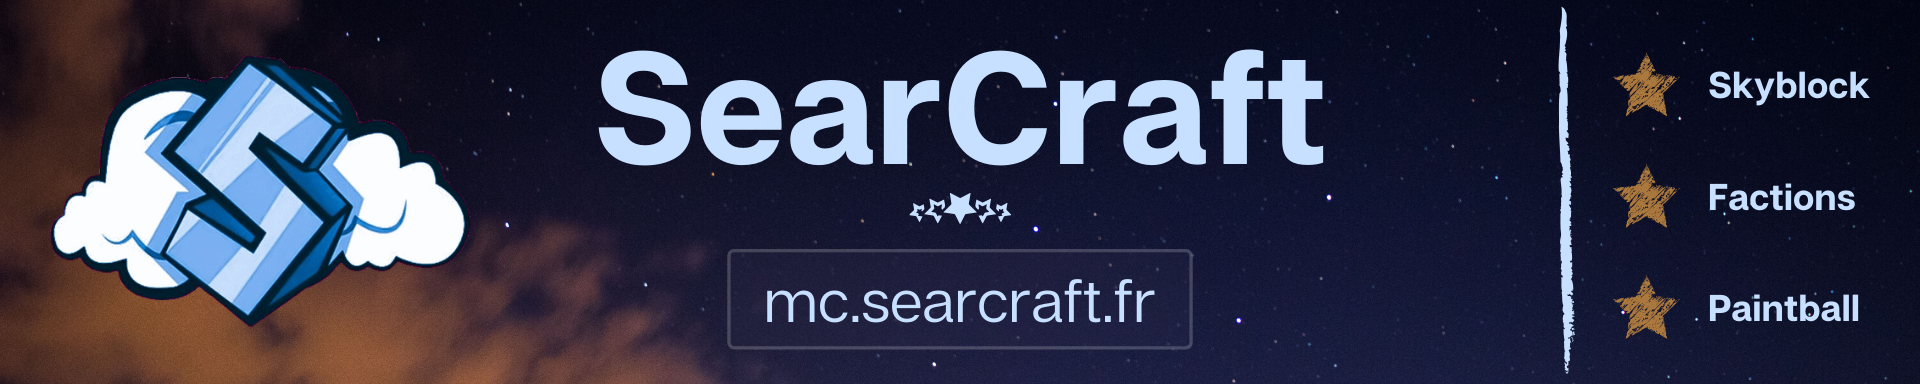 SearCraft